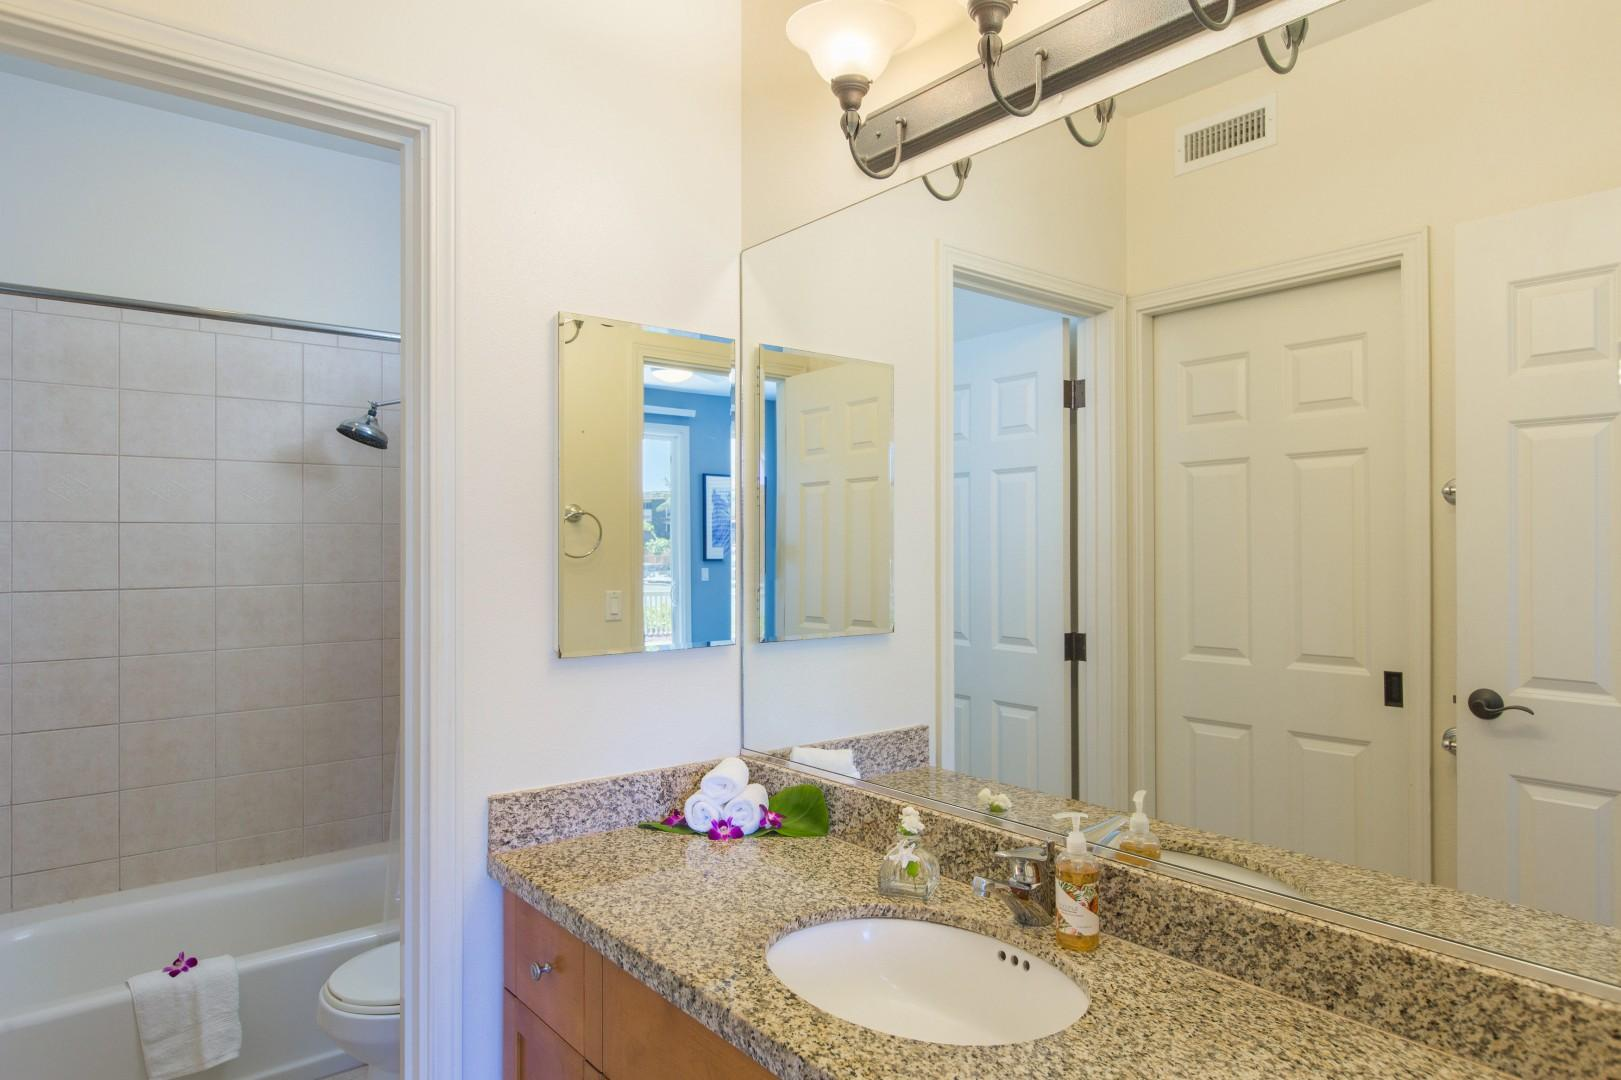 Master en suite bathroom with walk-in closet to the left.